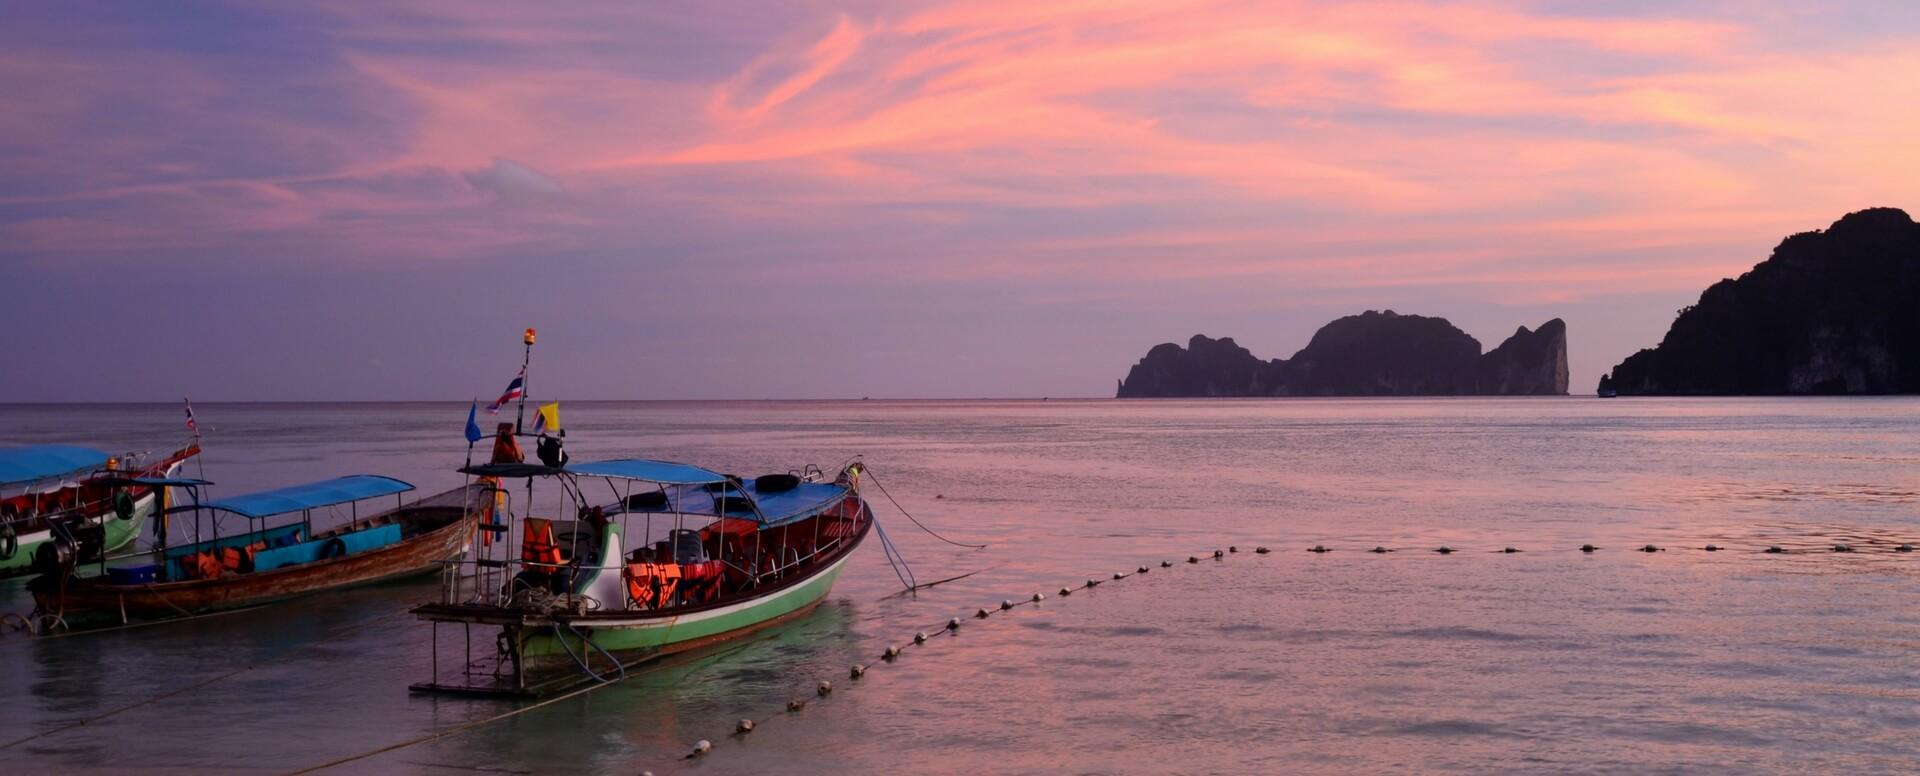 Discover the most beautiful beaches of Phuket - Phuket